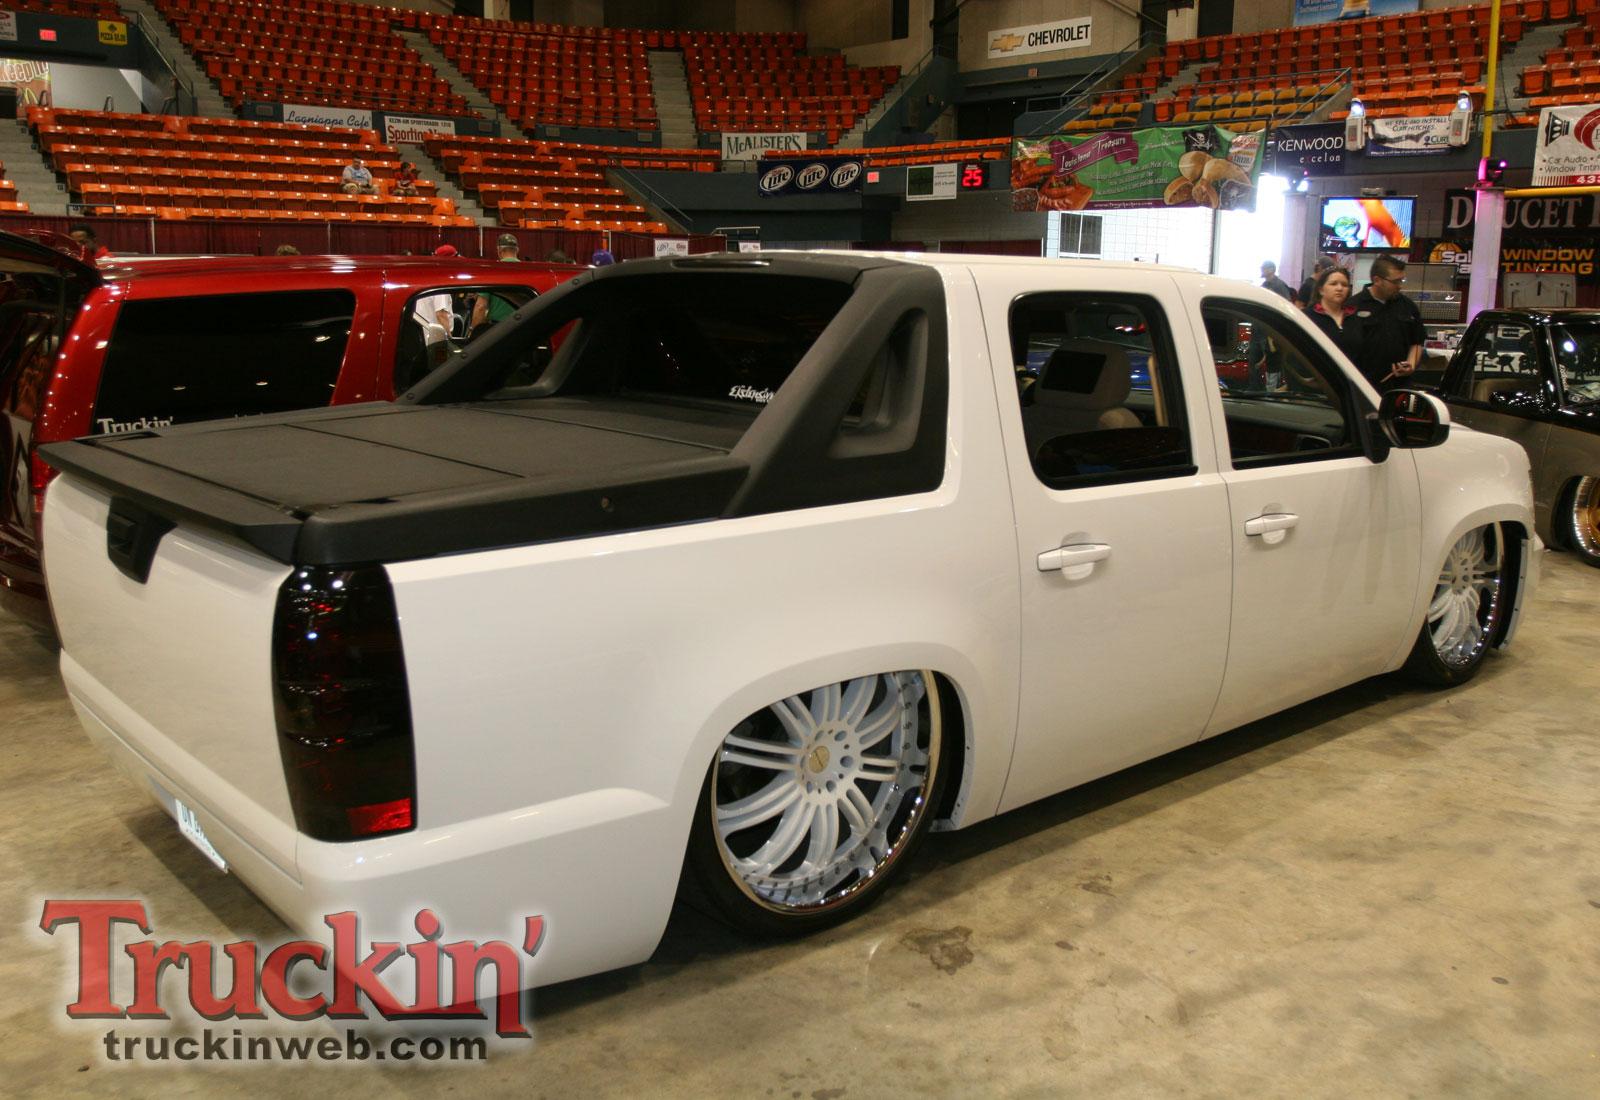 1004trweb_66+2010_midnight_fantasies_truck_show+chevy_avalanche_custom_rear.jpg